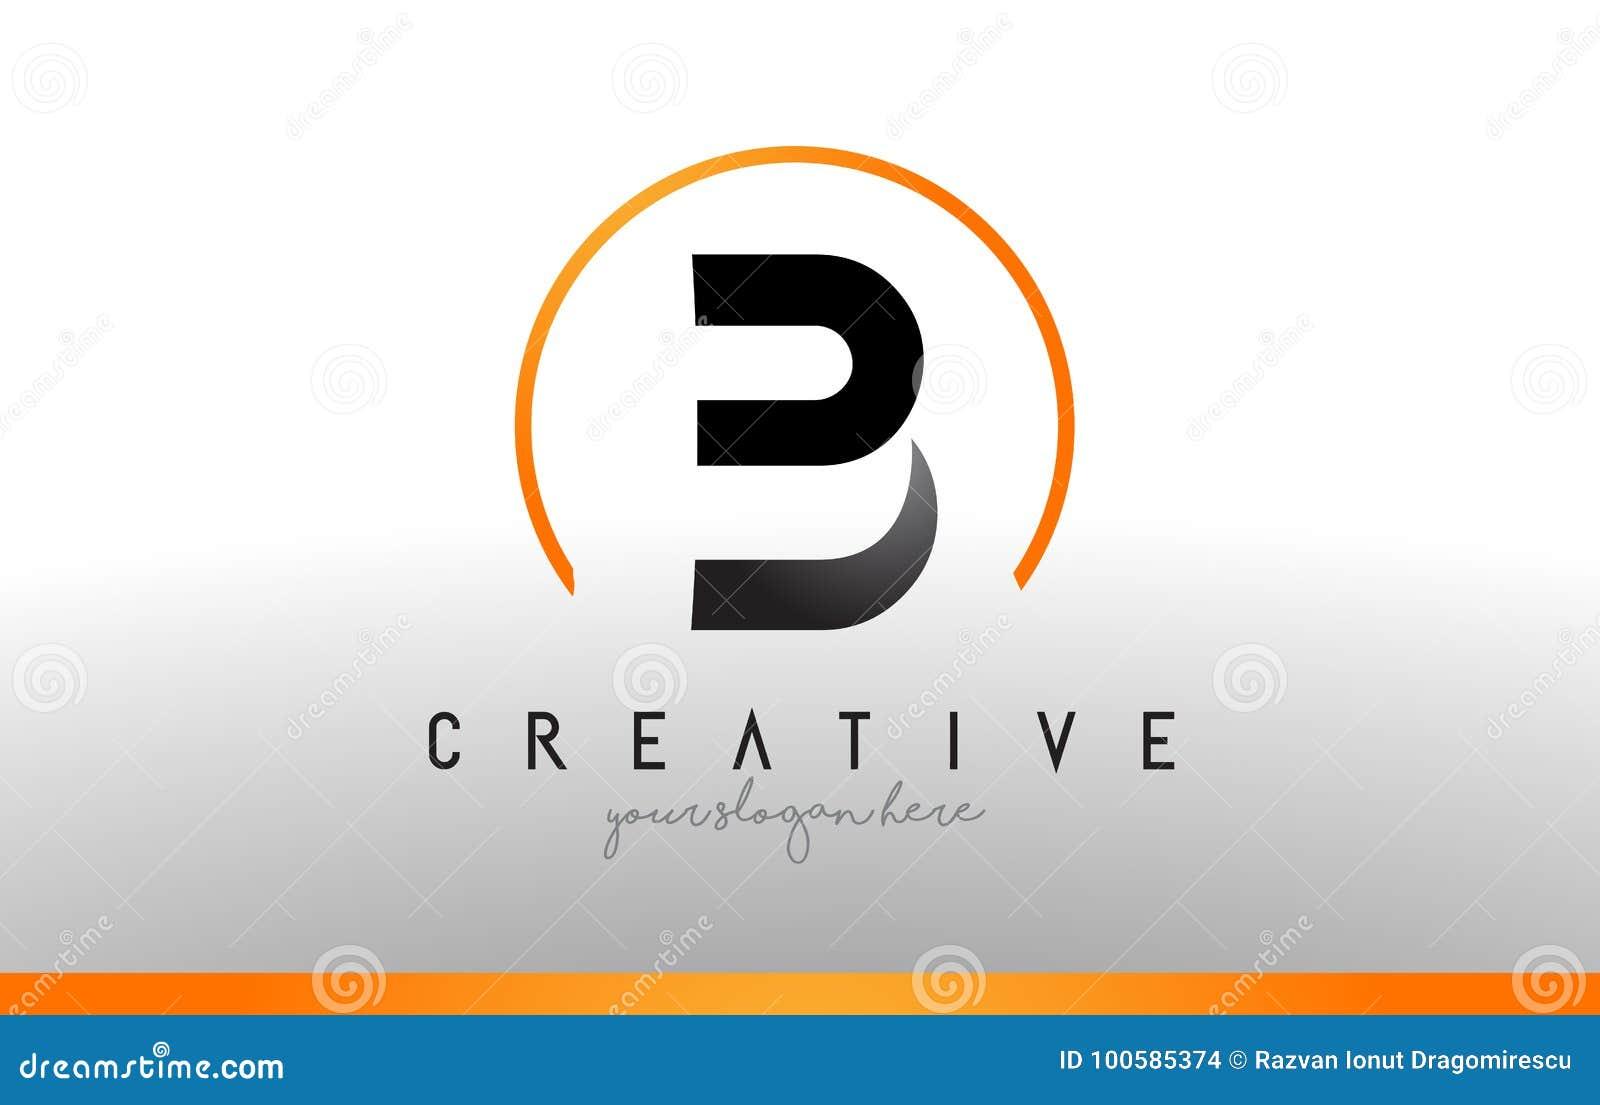 b letter logo design with black orange color cool modern icon t